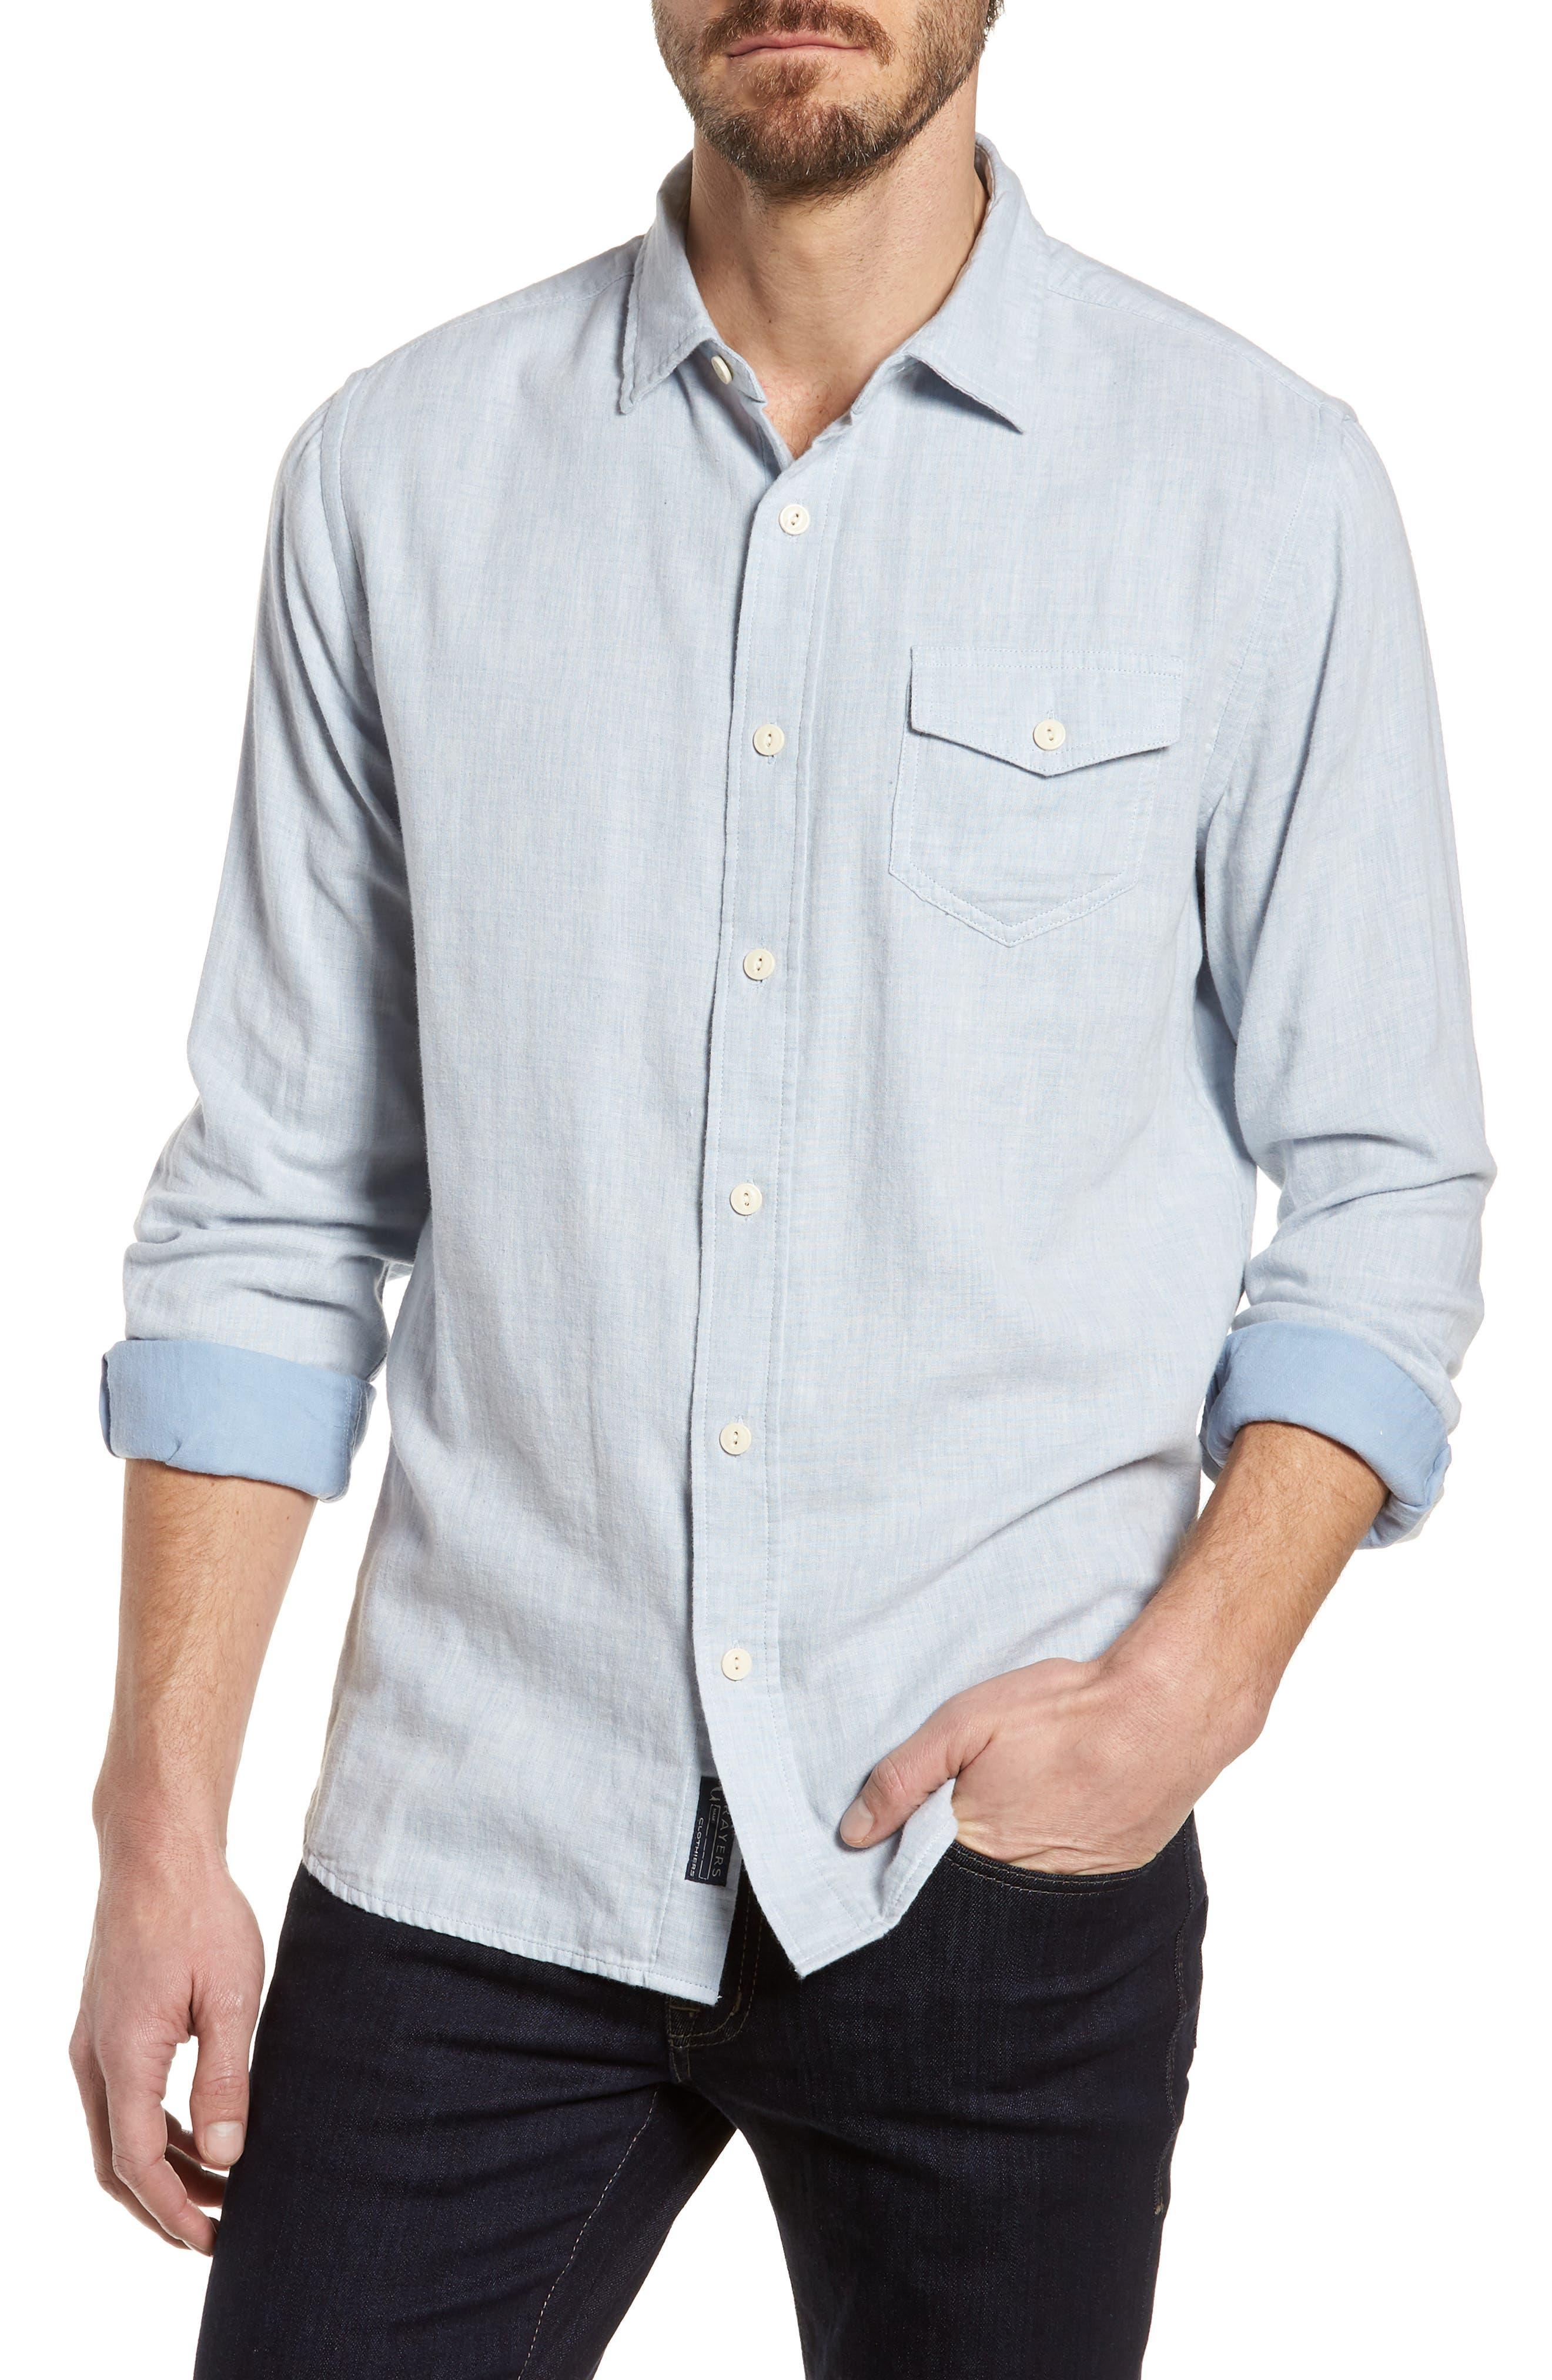 Hammond Slim Fit Sport Shirt,                         Main,                         color, Light Blue Heather